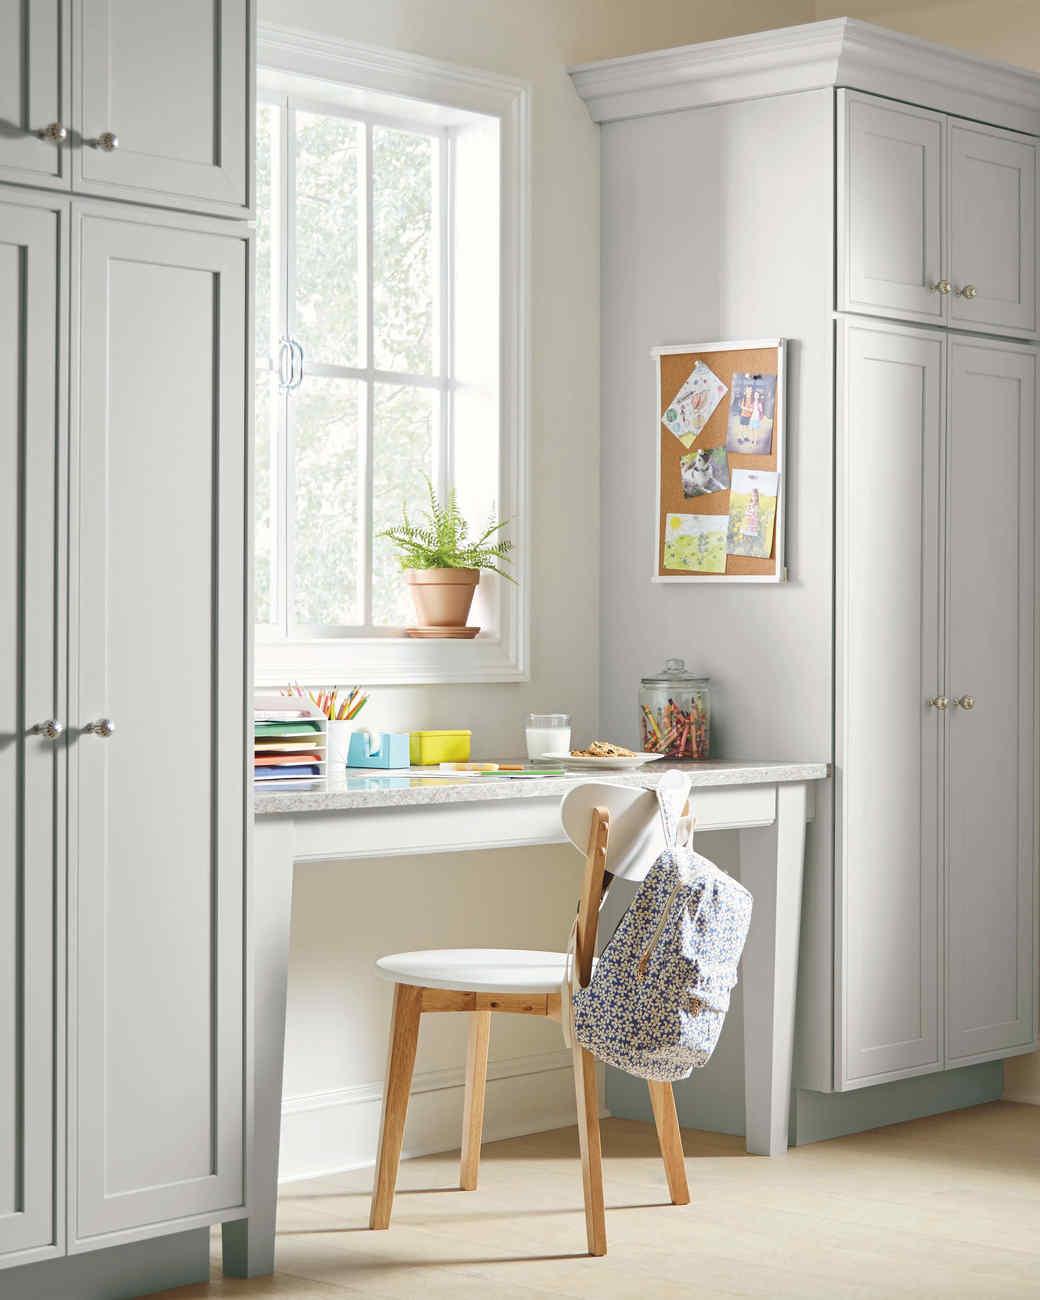 Home Depot Kitchen Remodel: Kitchen Layout & Shape